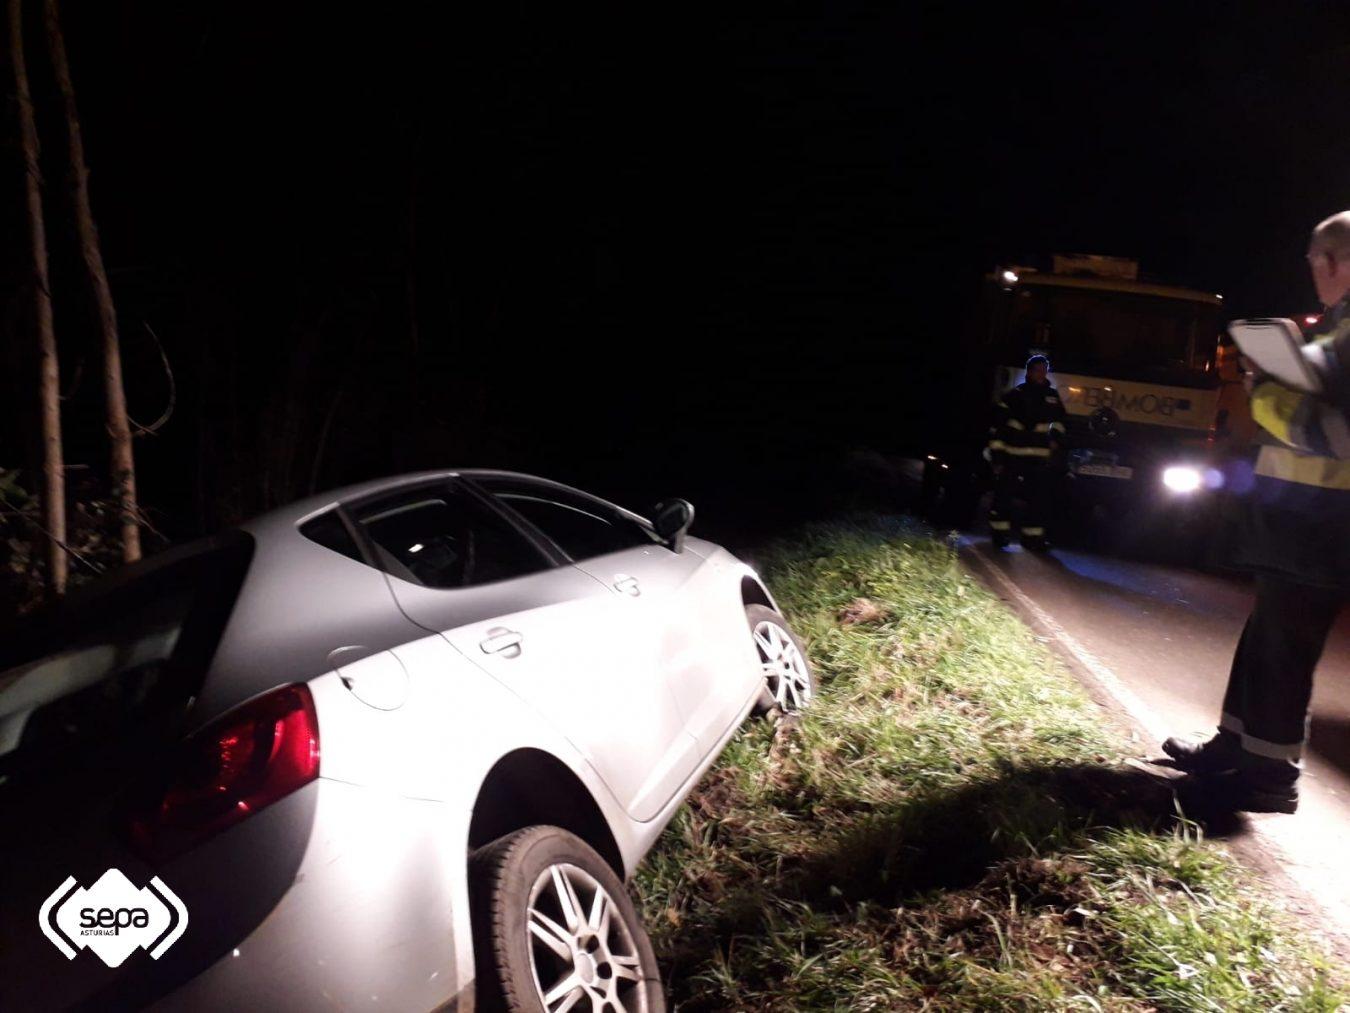 Una persona resulta herida tras salirse de la carretera en el cruce de Carrandi (Colunga)